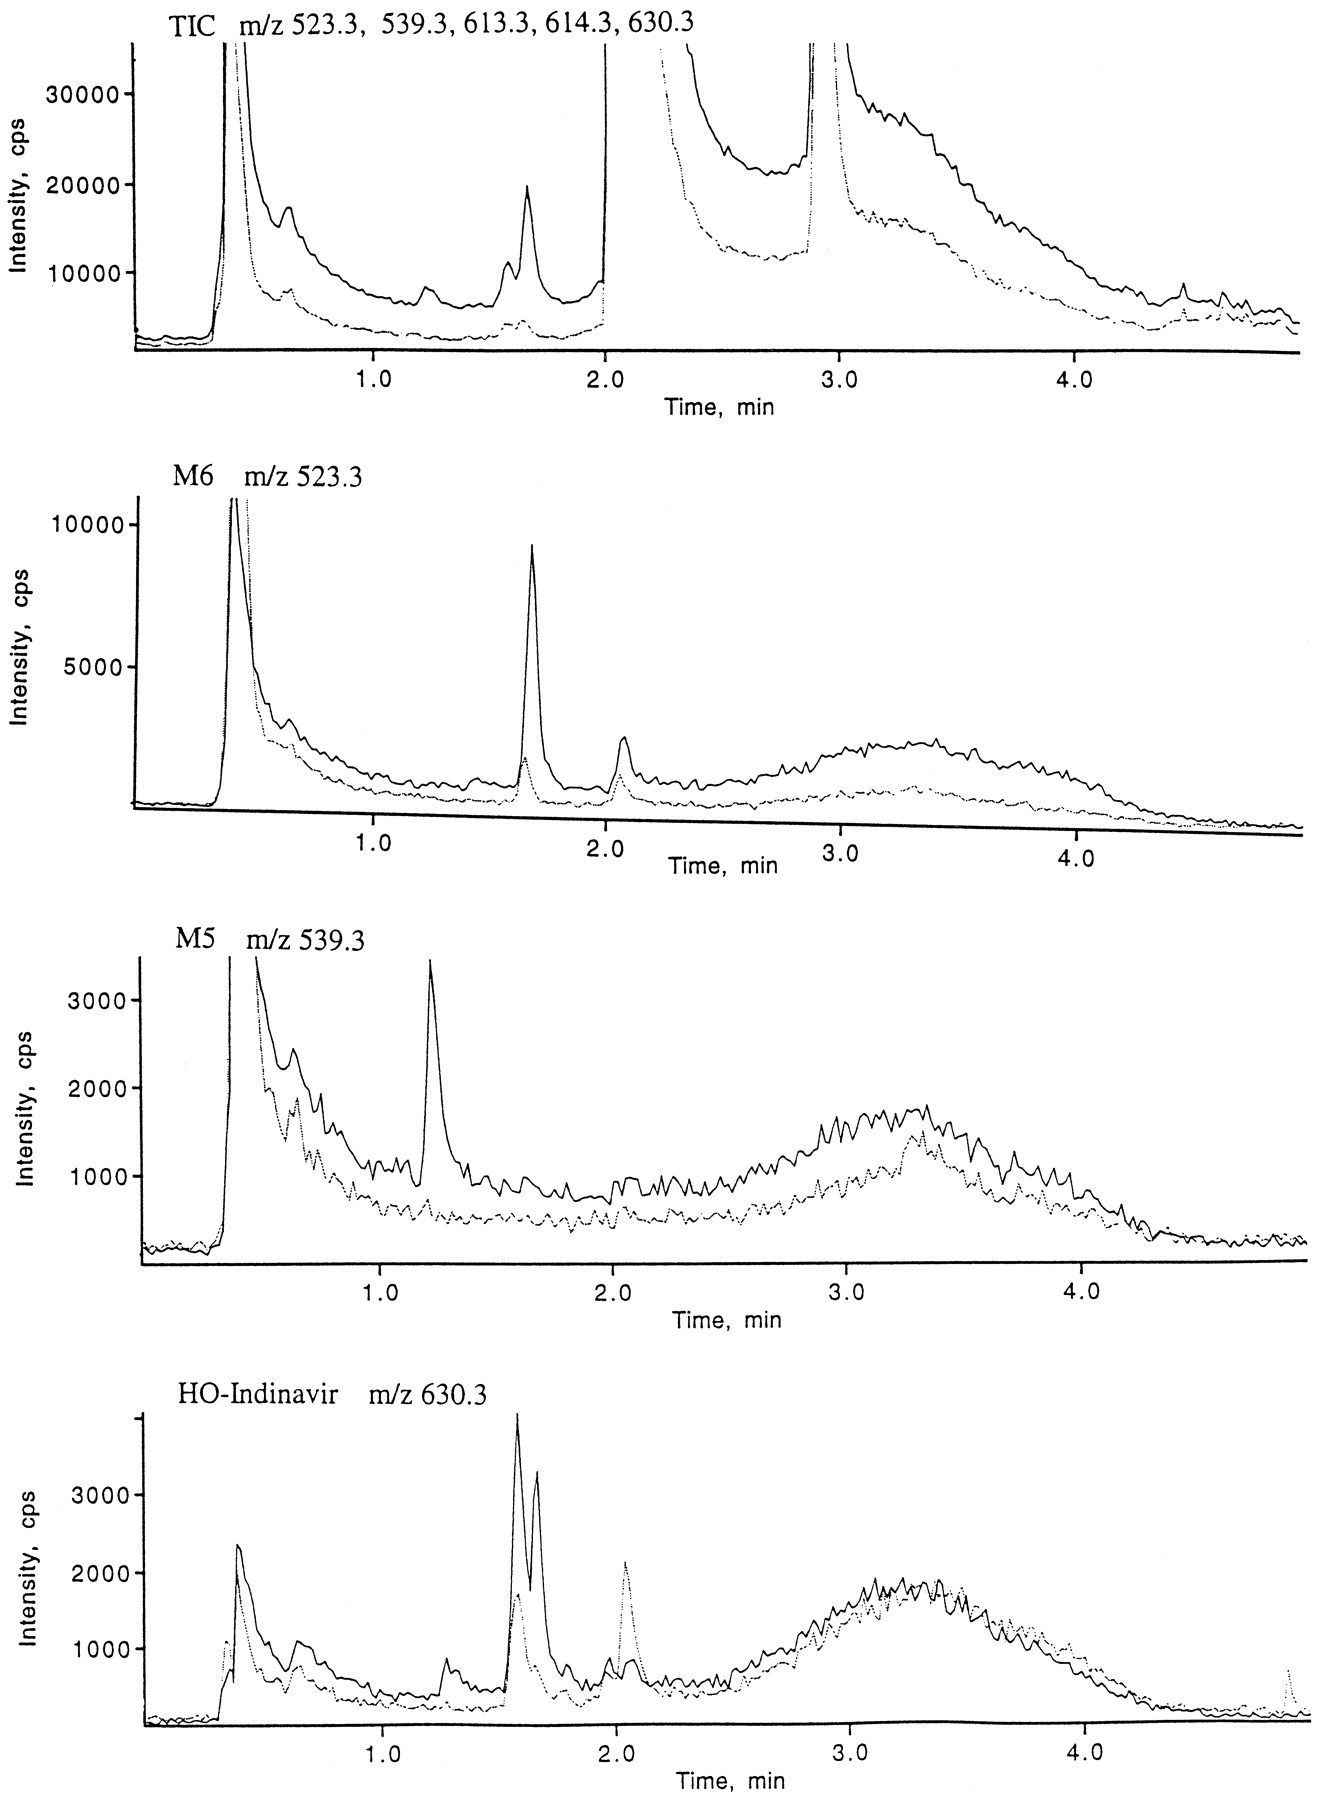 extracted ion chromatogram